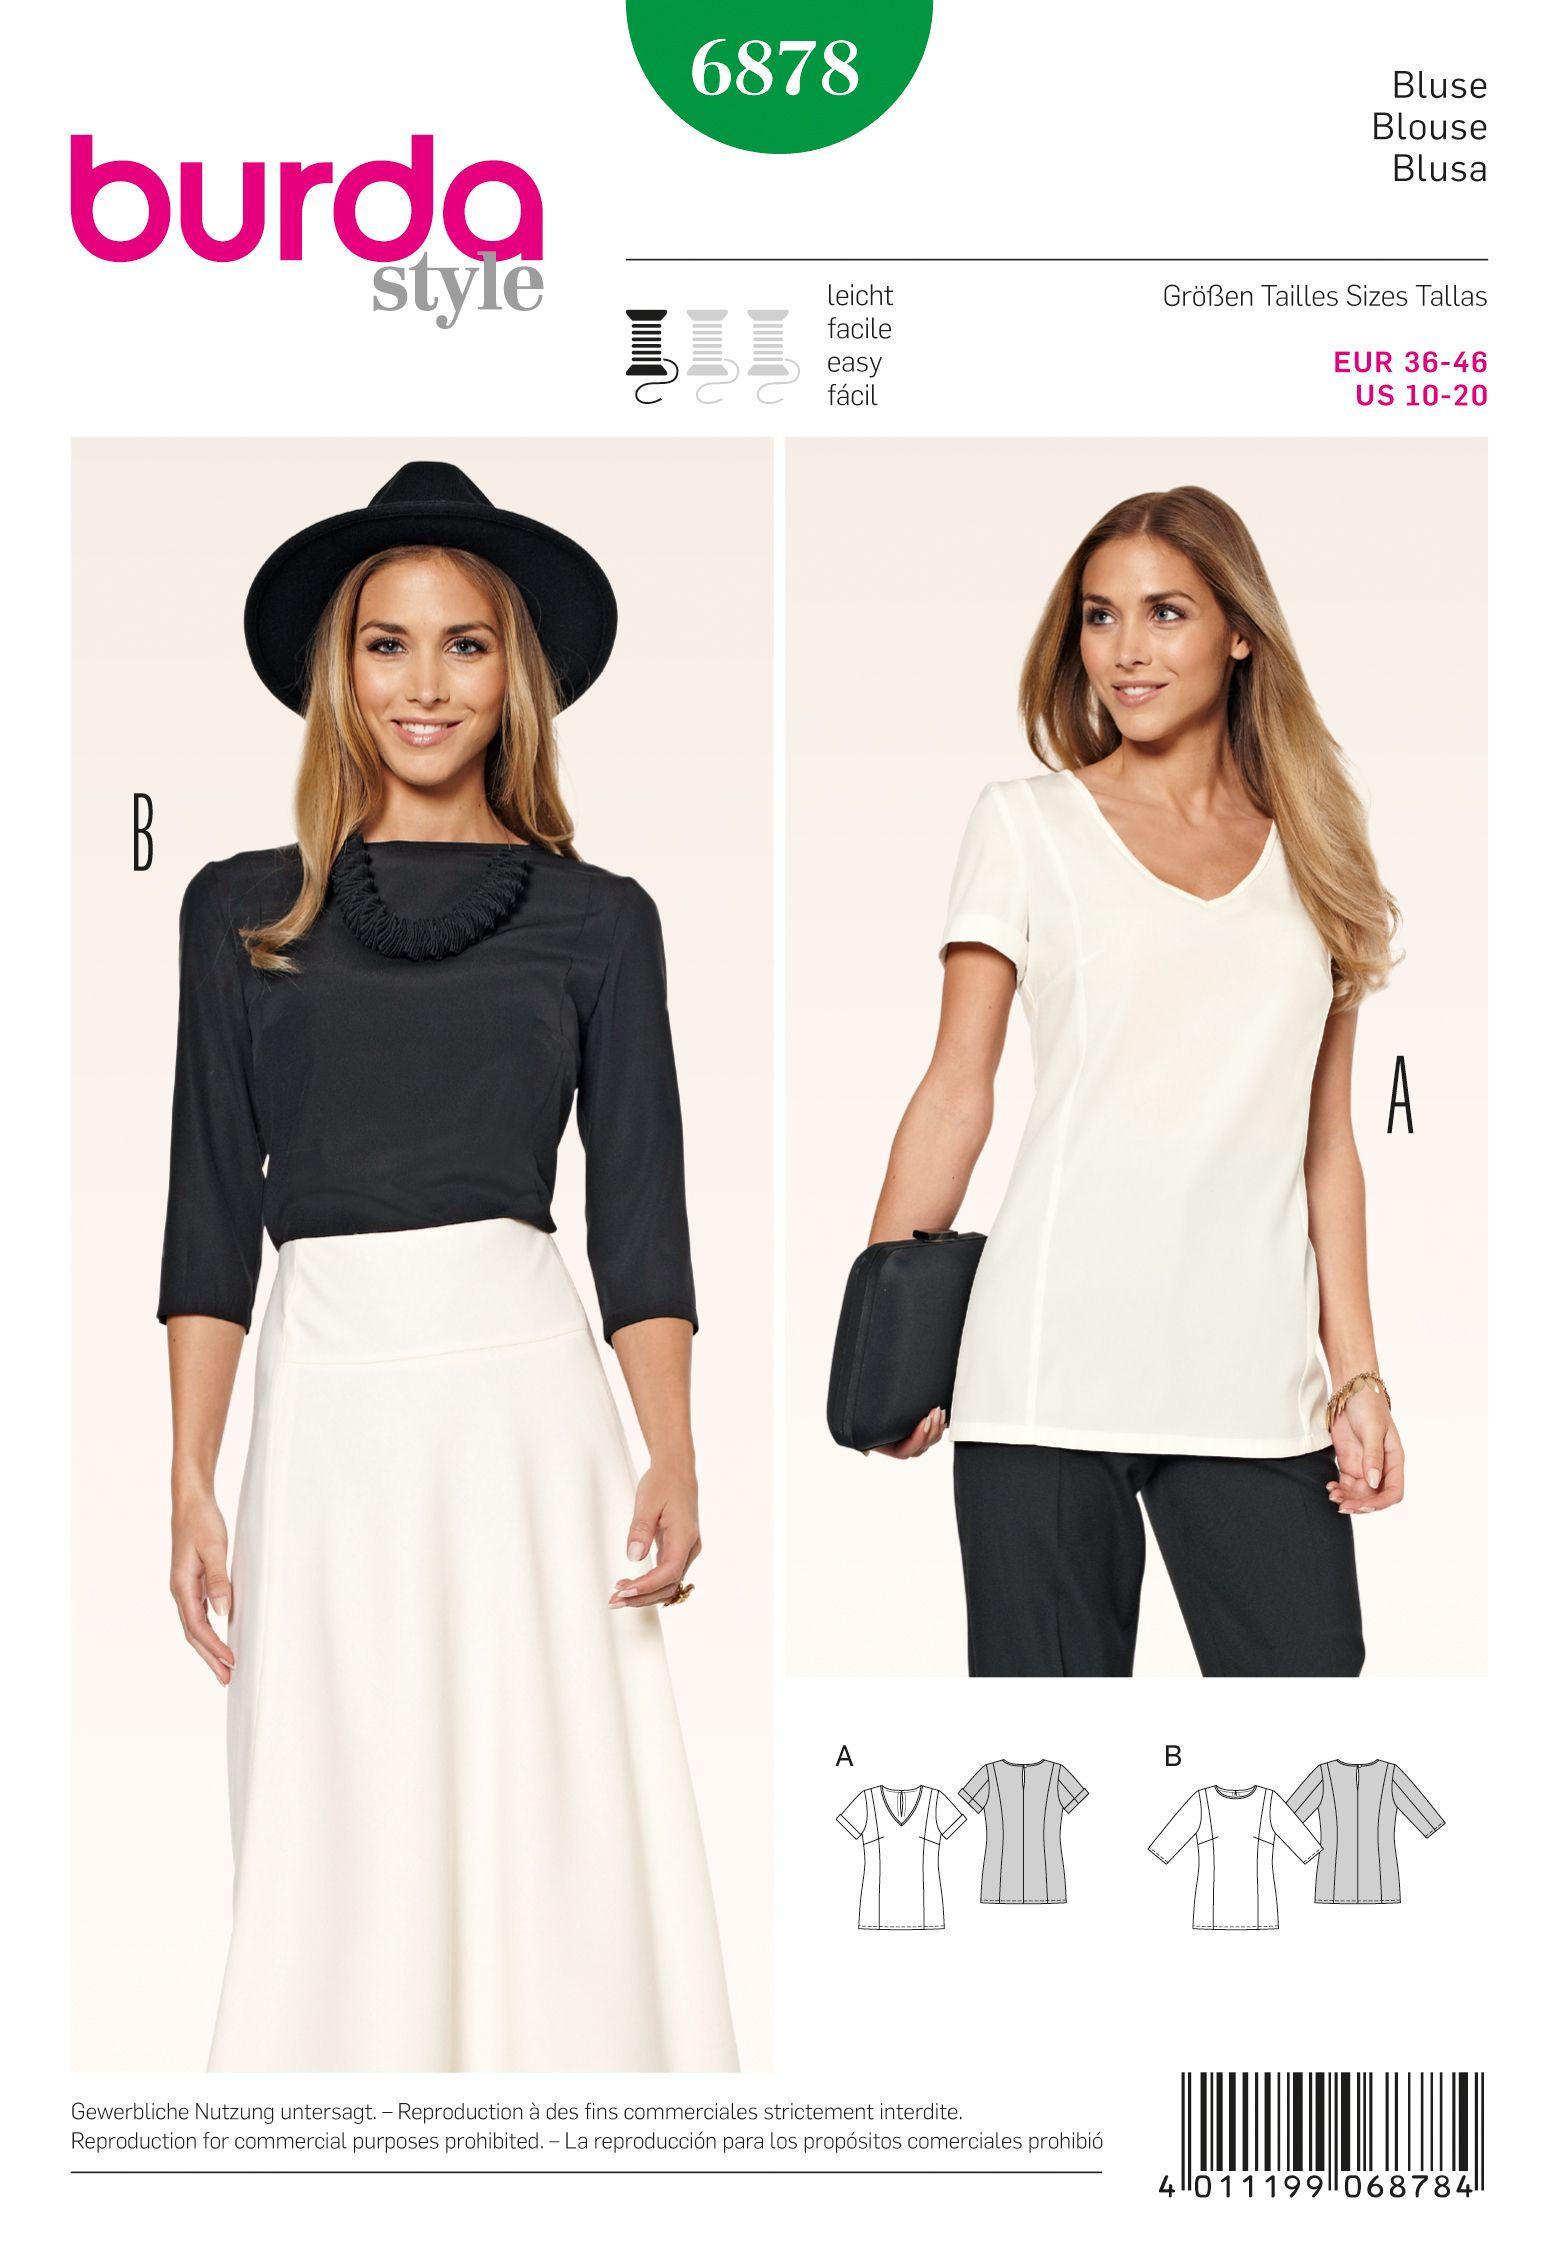 Burda 6878 circa 2015. I really like the blouse with the dart ...